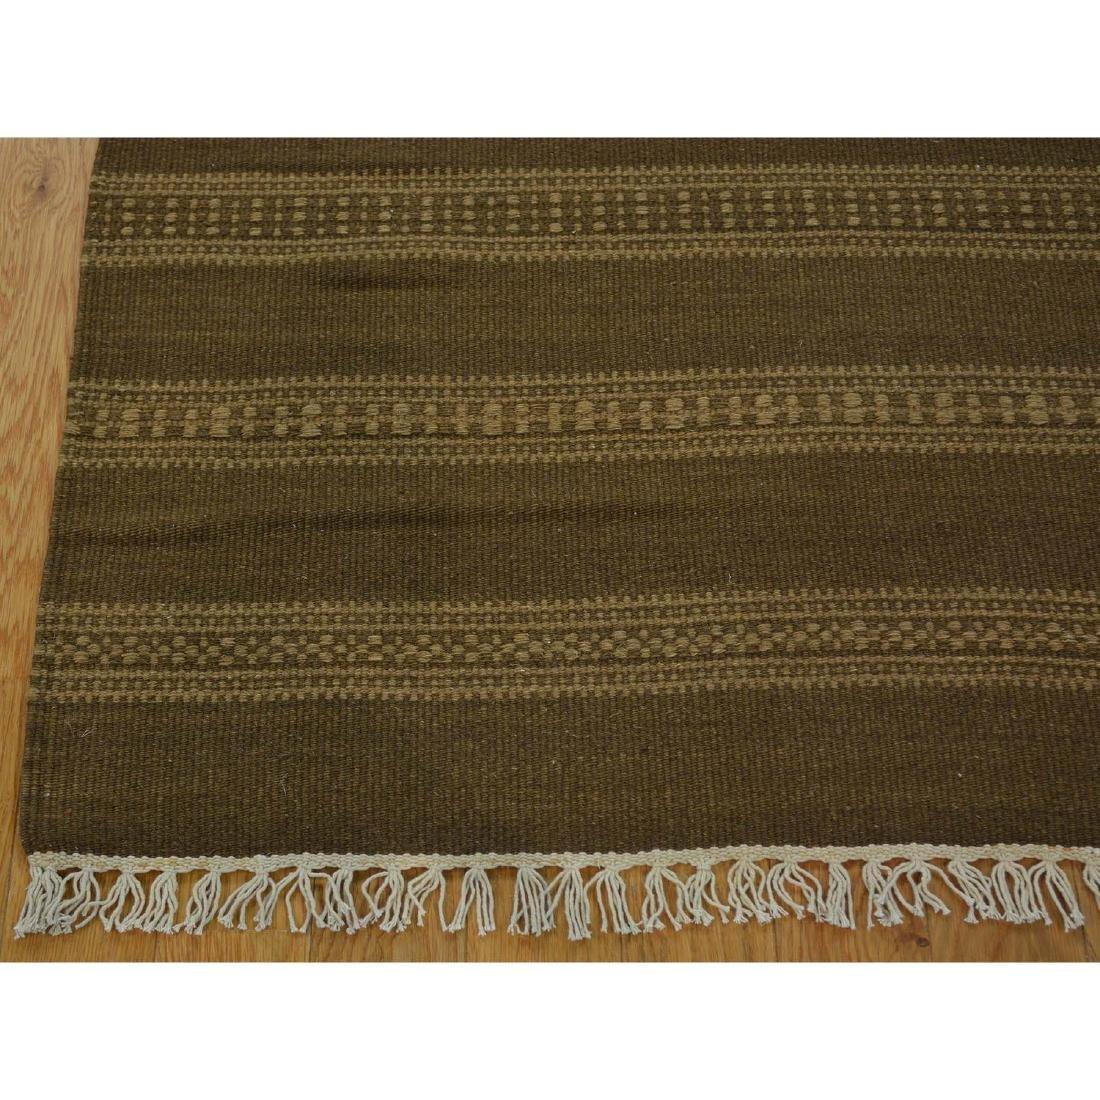 Wool Durie Kilim Rug Hand Woven Flat Weave 3x5.1 - 4